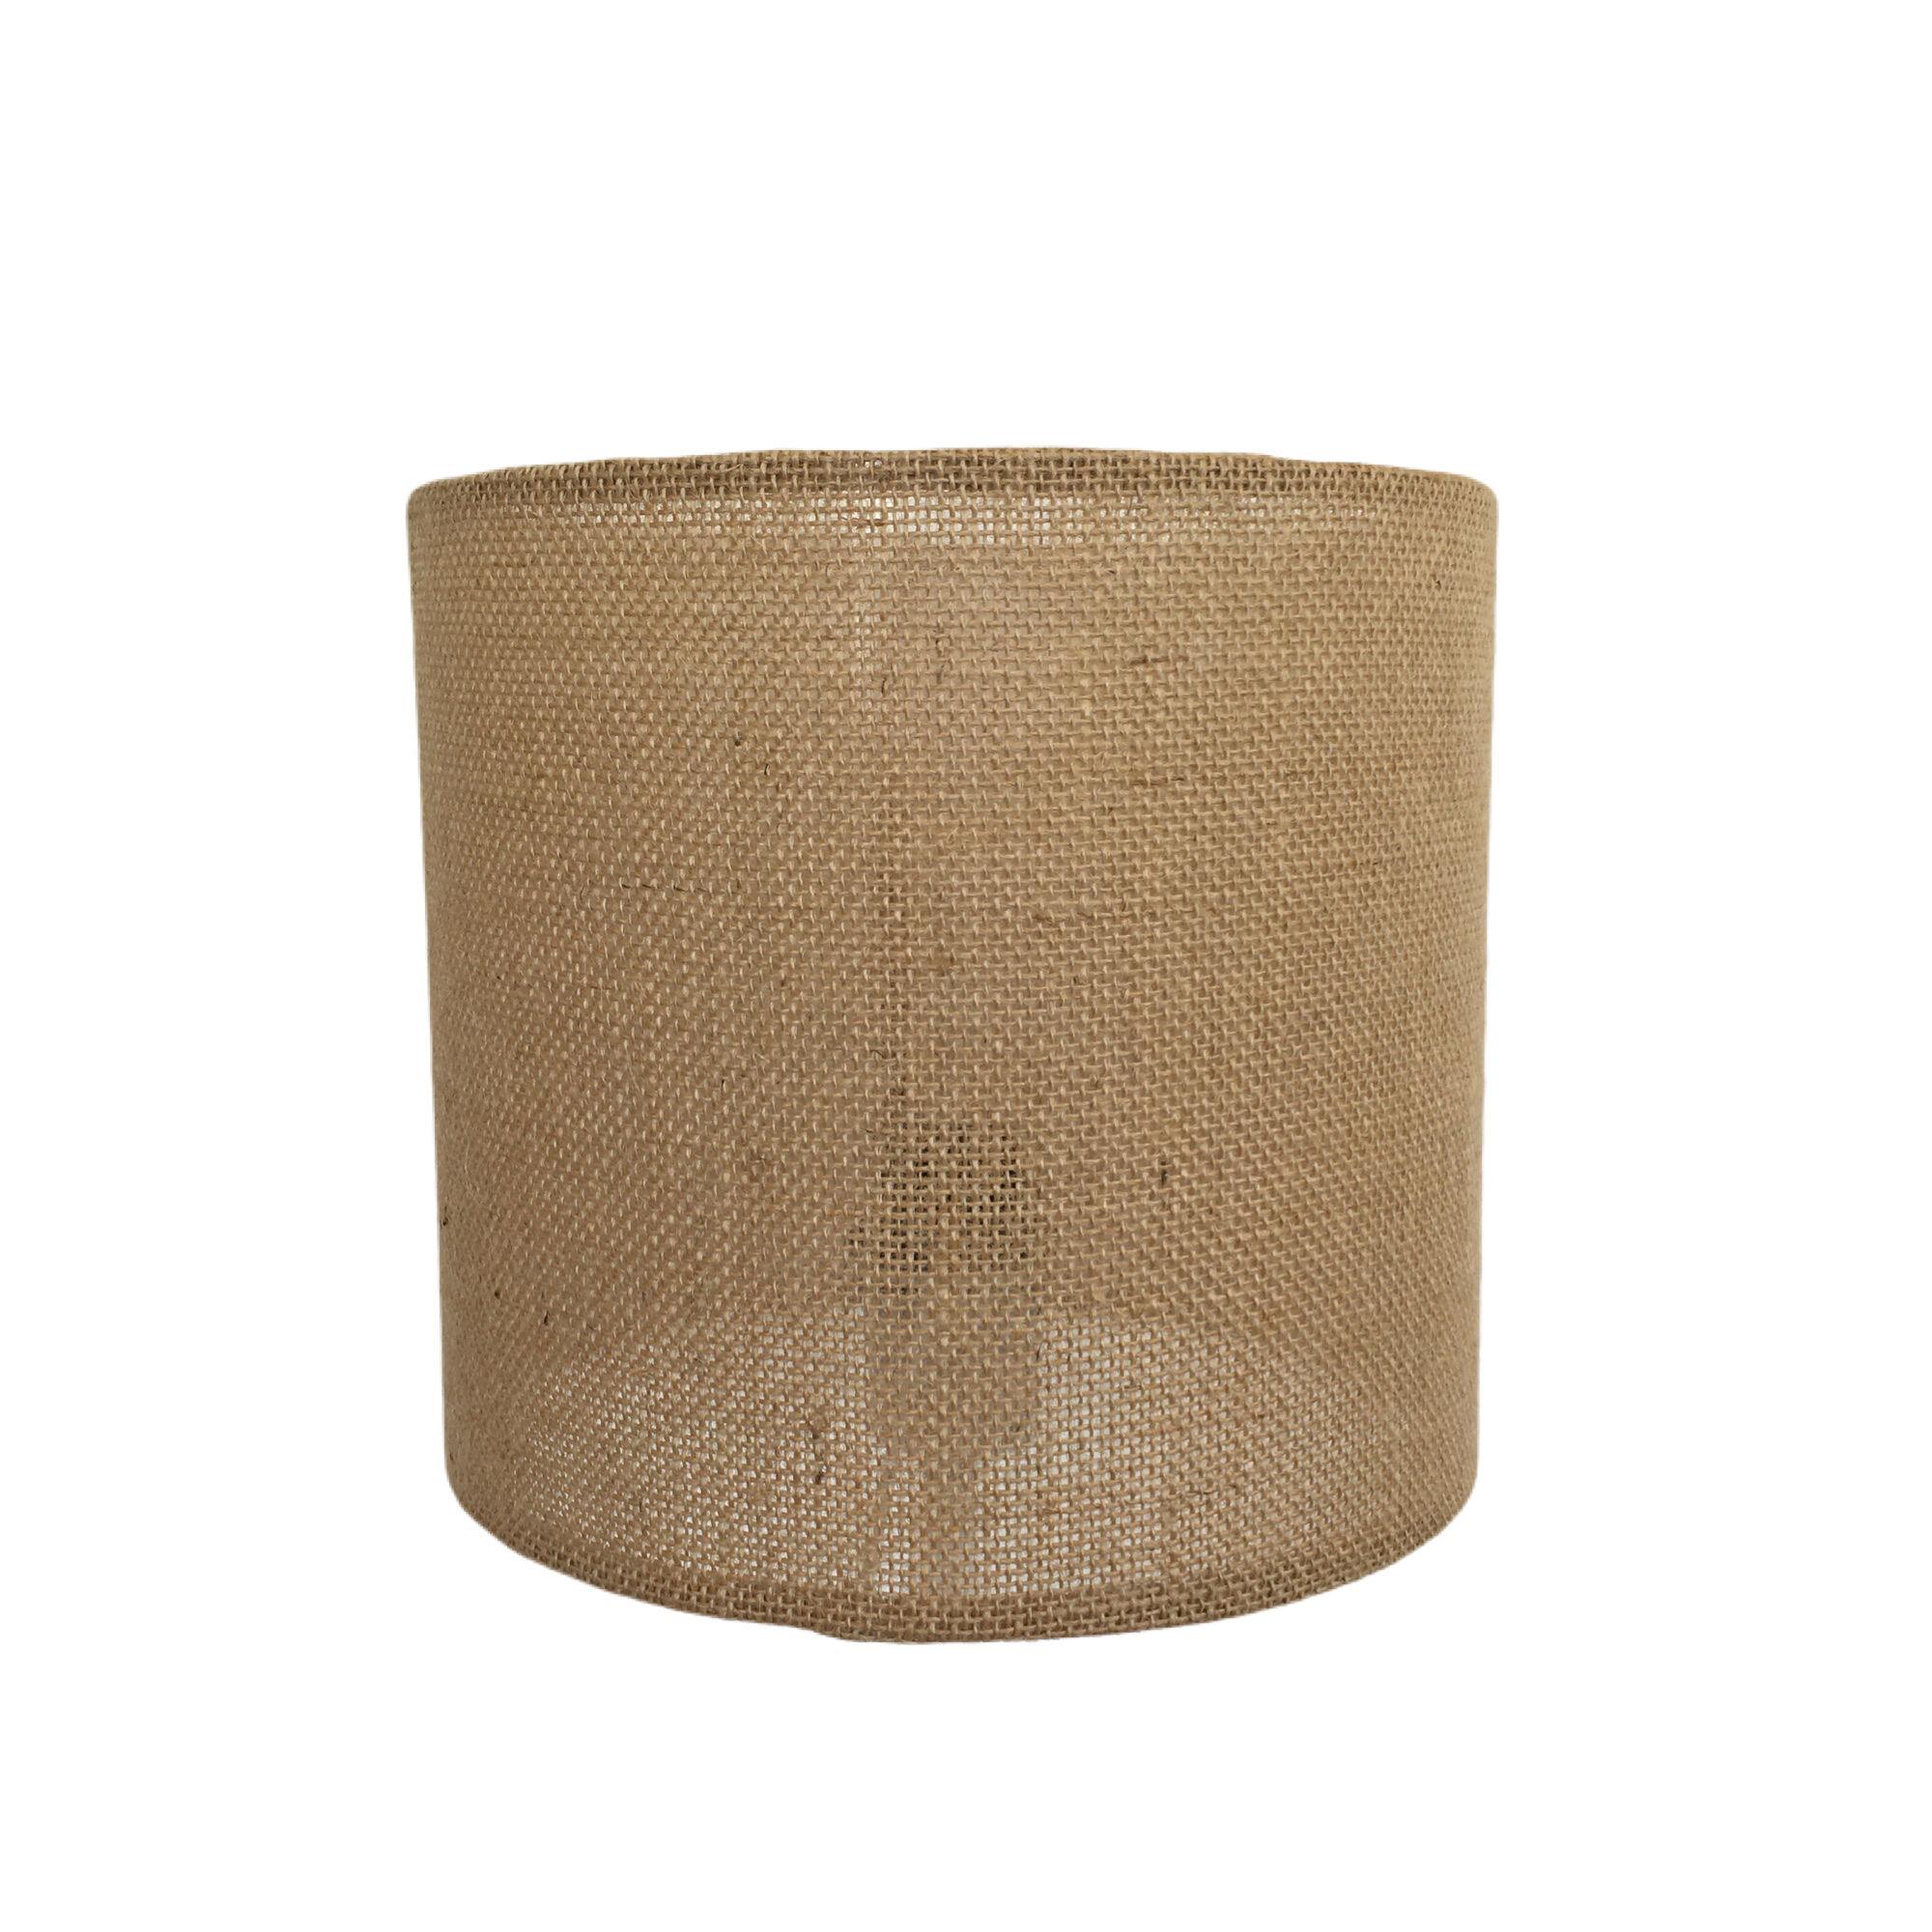 Belamp Suspension toile de jute diamètre 40 cm